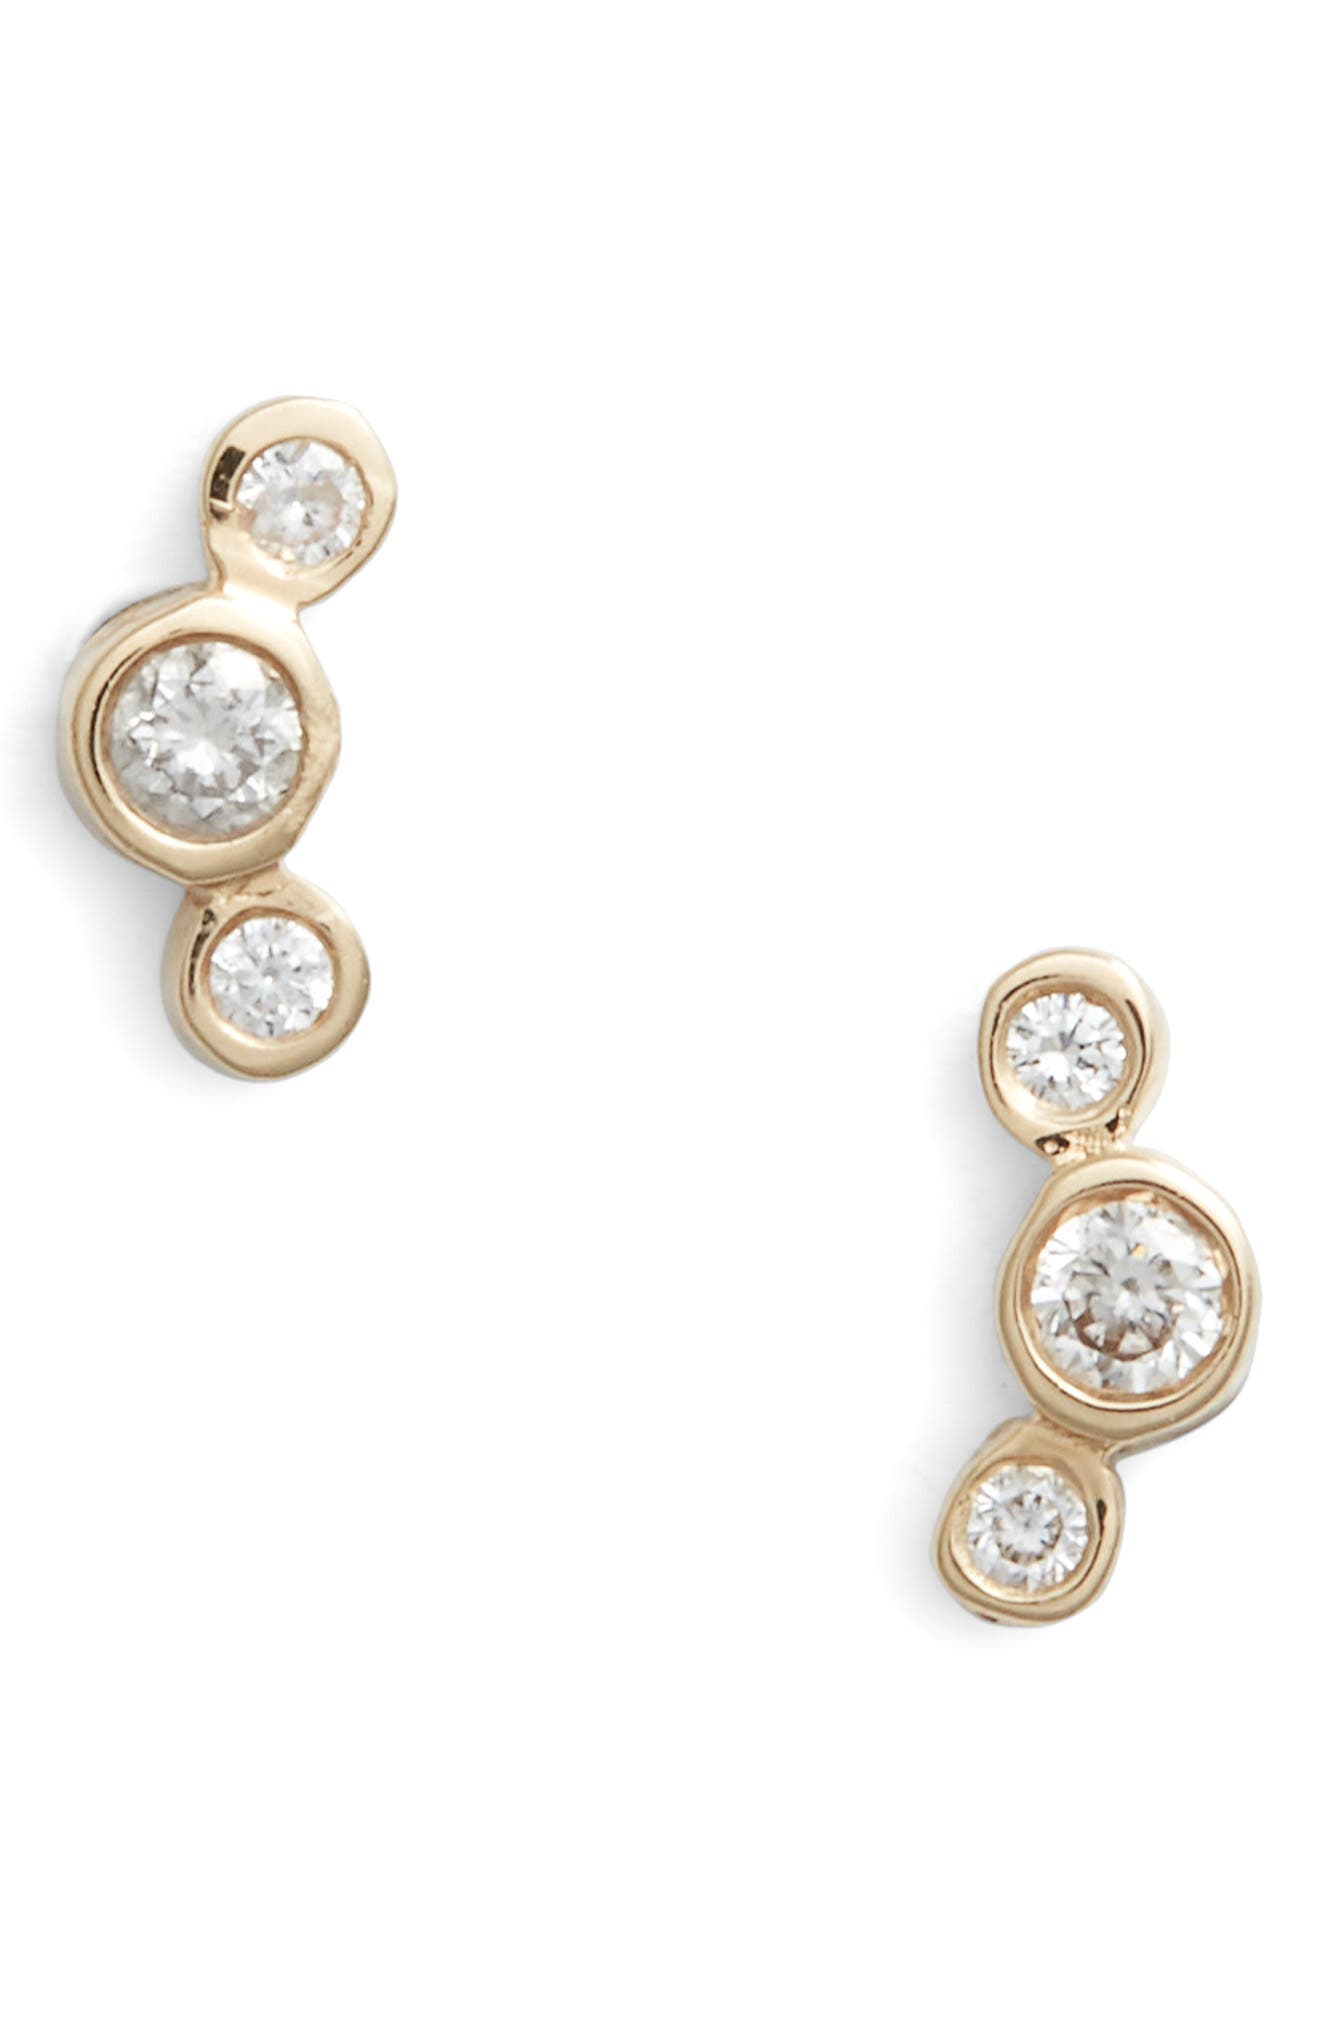 Zoe Chicco Curved 3-Diamond Stud Earrings